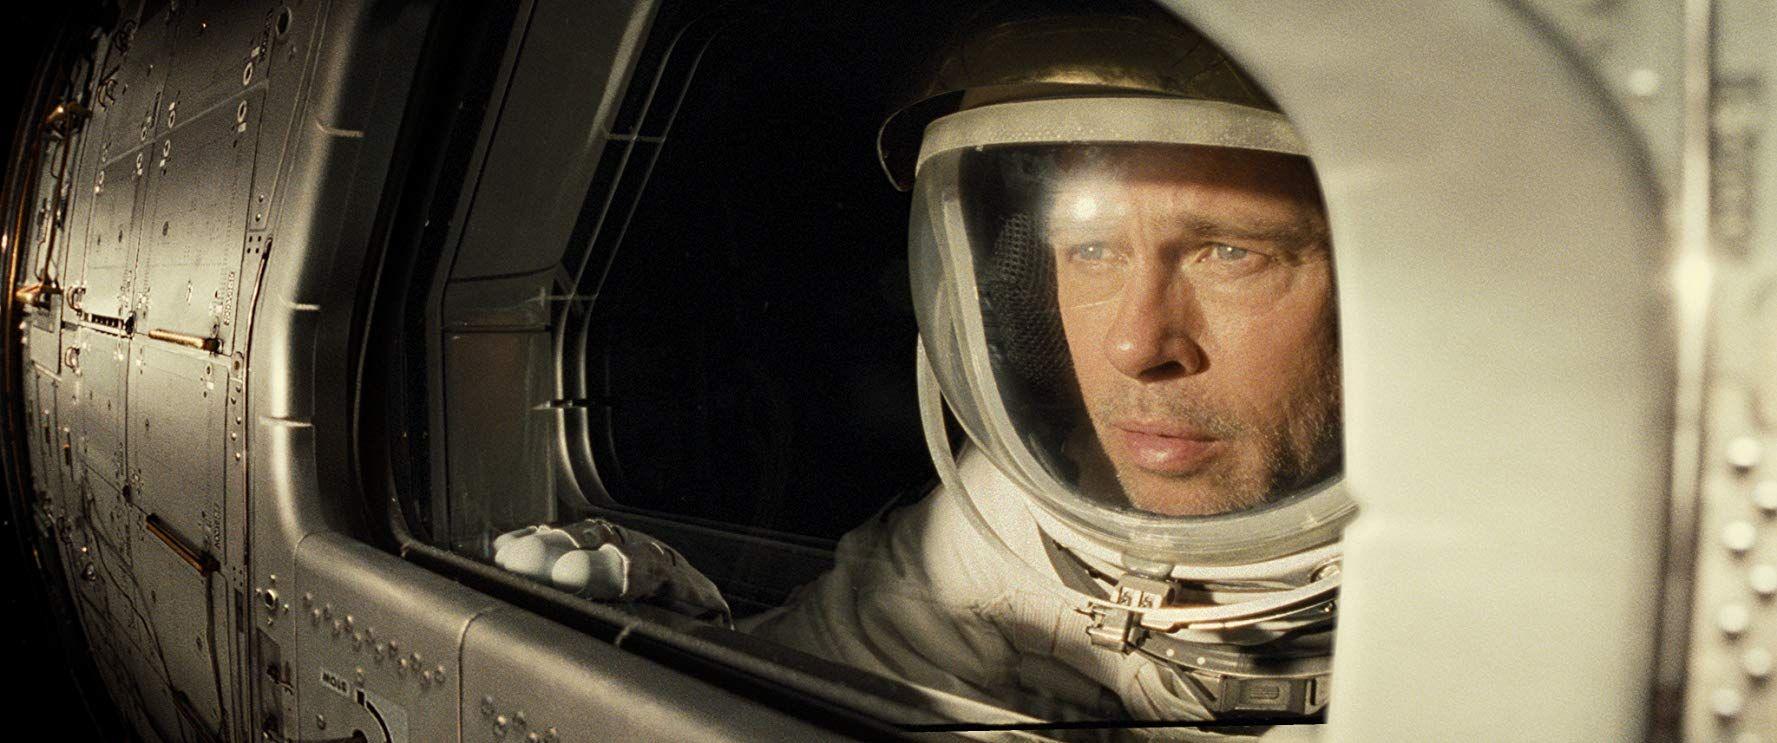 Ad Astra: trois raisons d'aller explorer le cosmos avec Brad Pitt